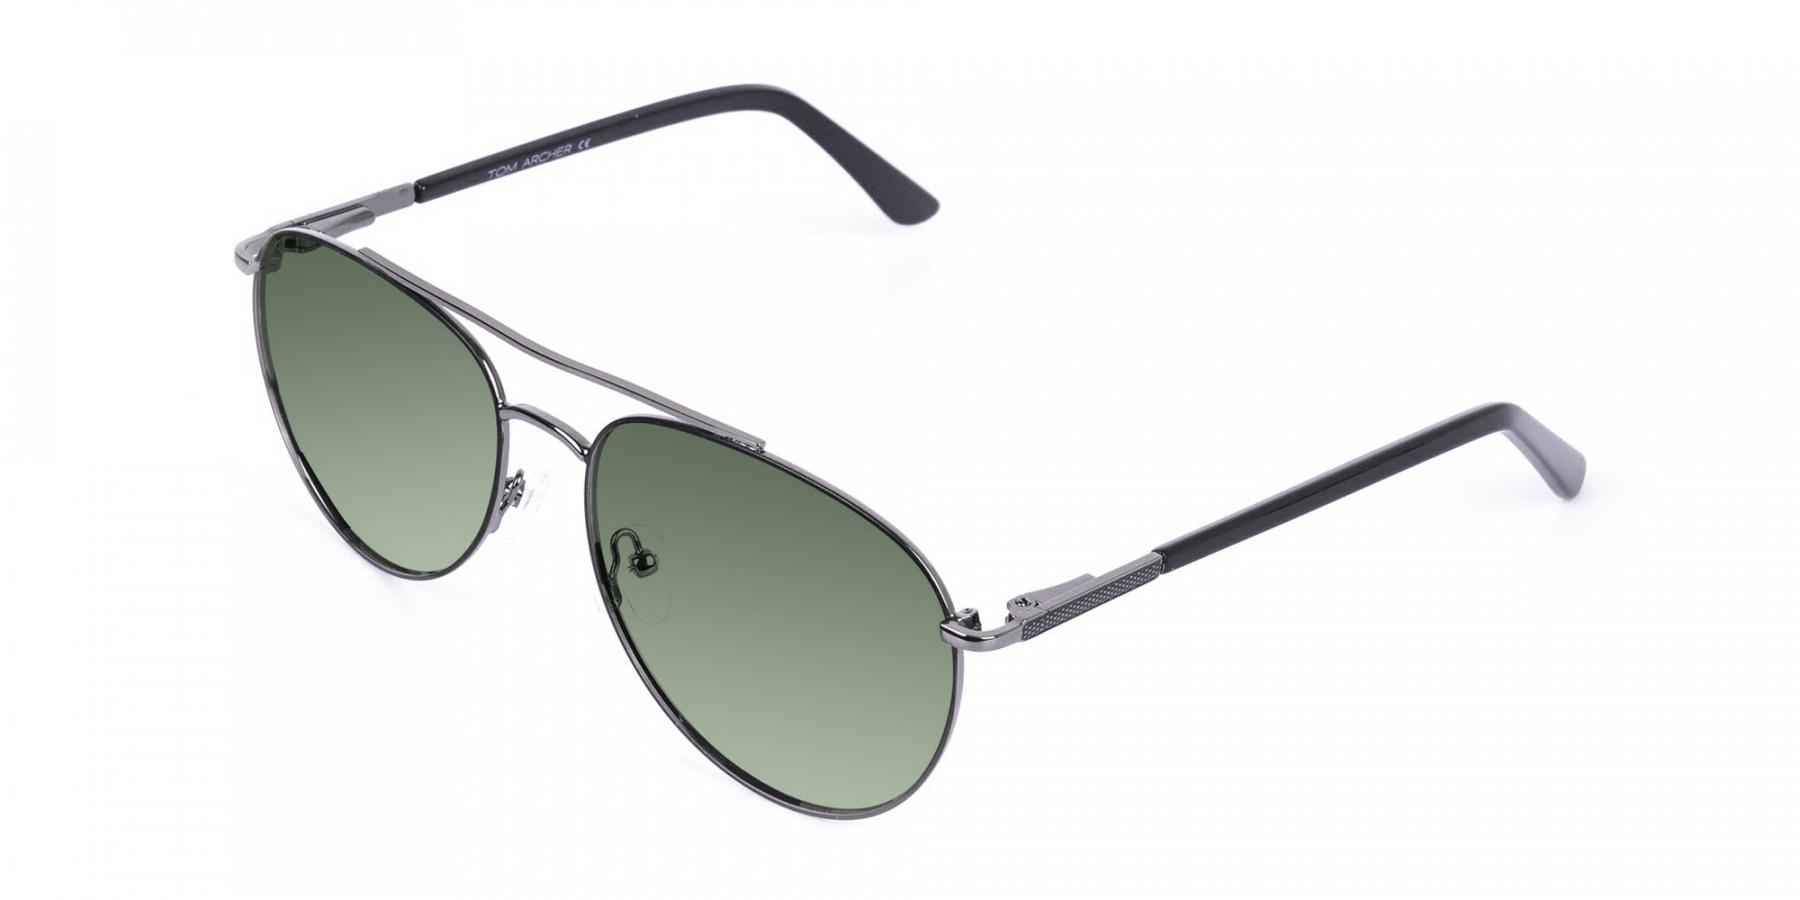 ultralight-gunmetal-black-aviator-grey-tinted-sunglasses-frames-3